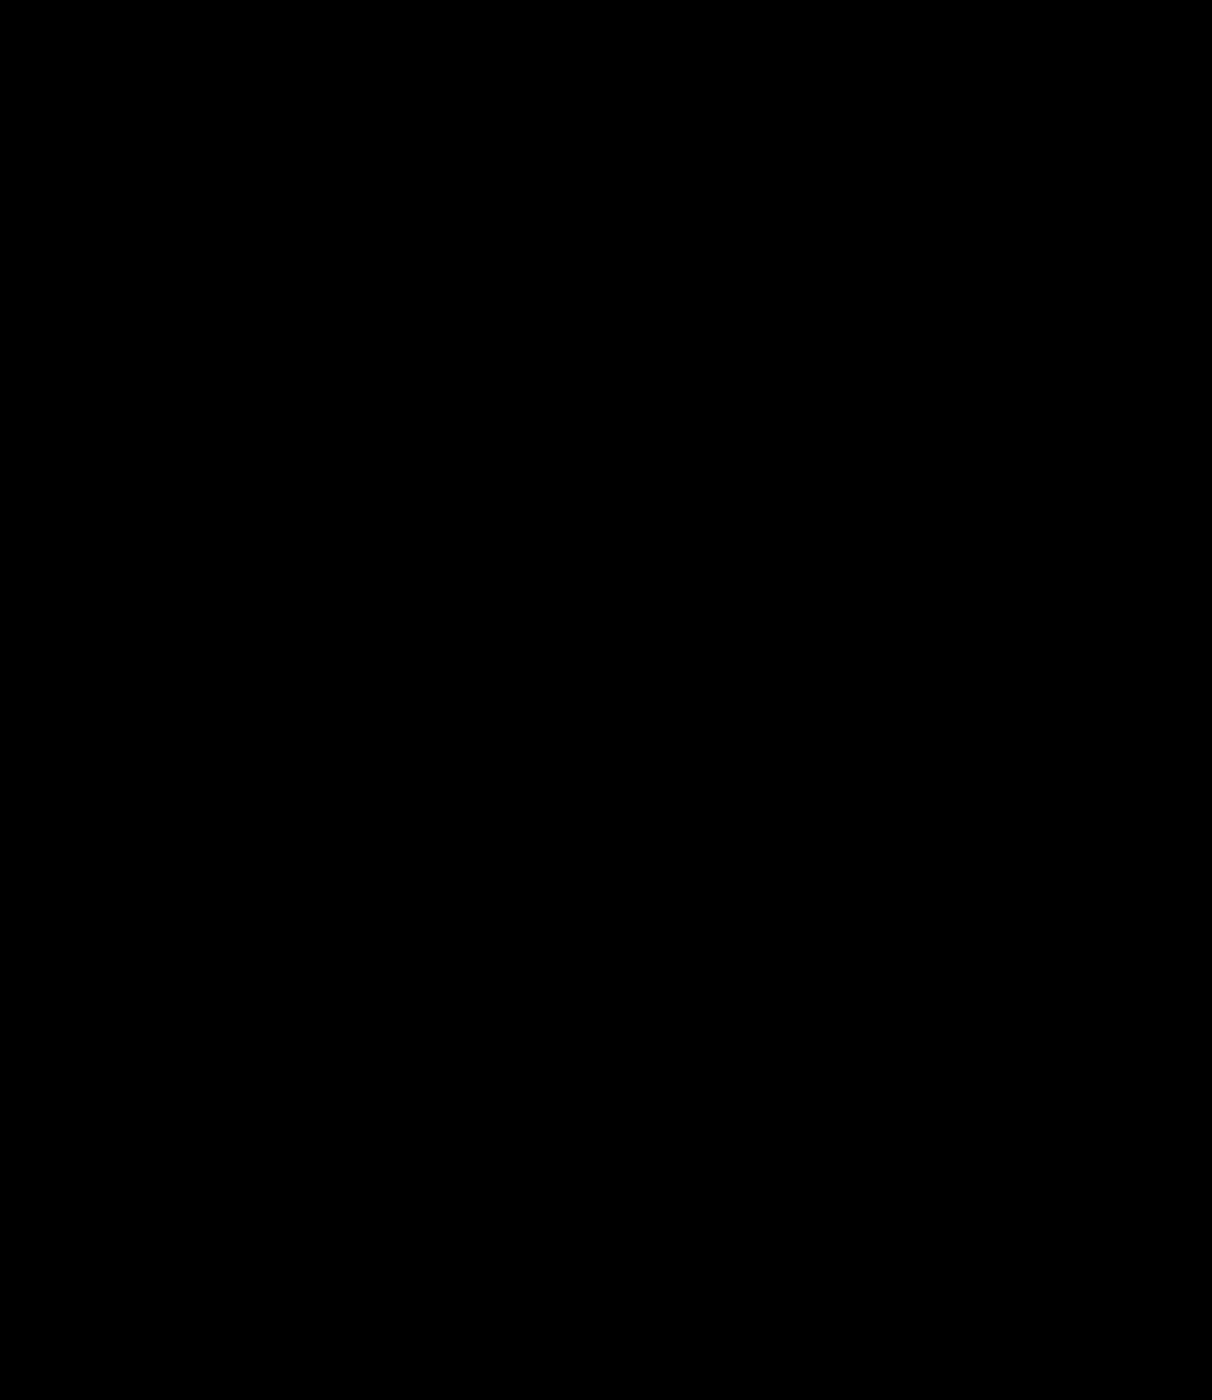 Dänischer Aufsatzsekretär um 1800